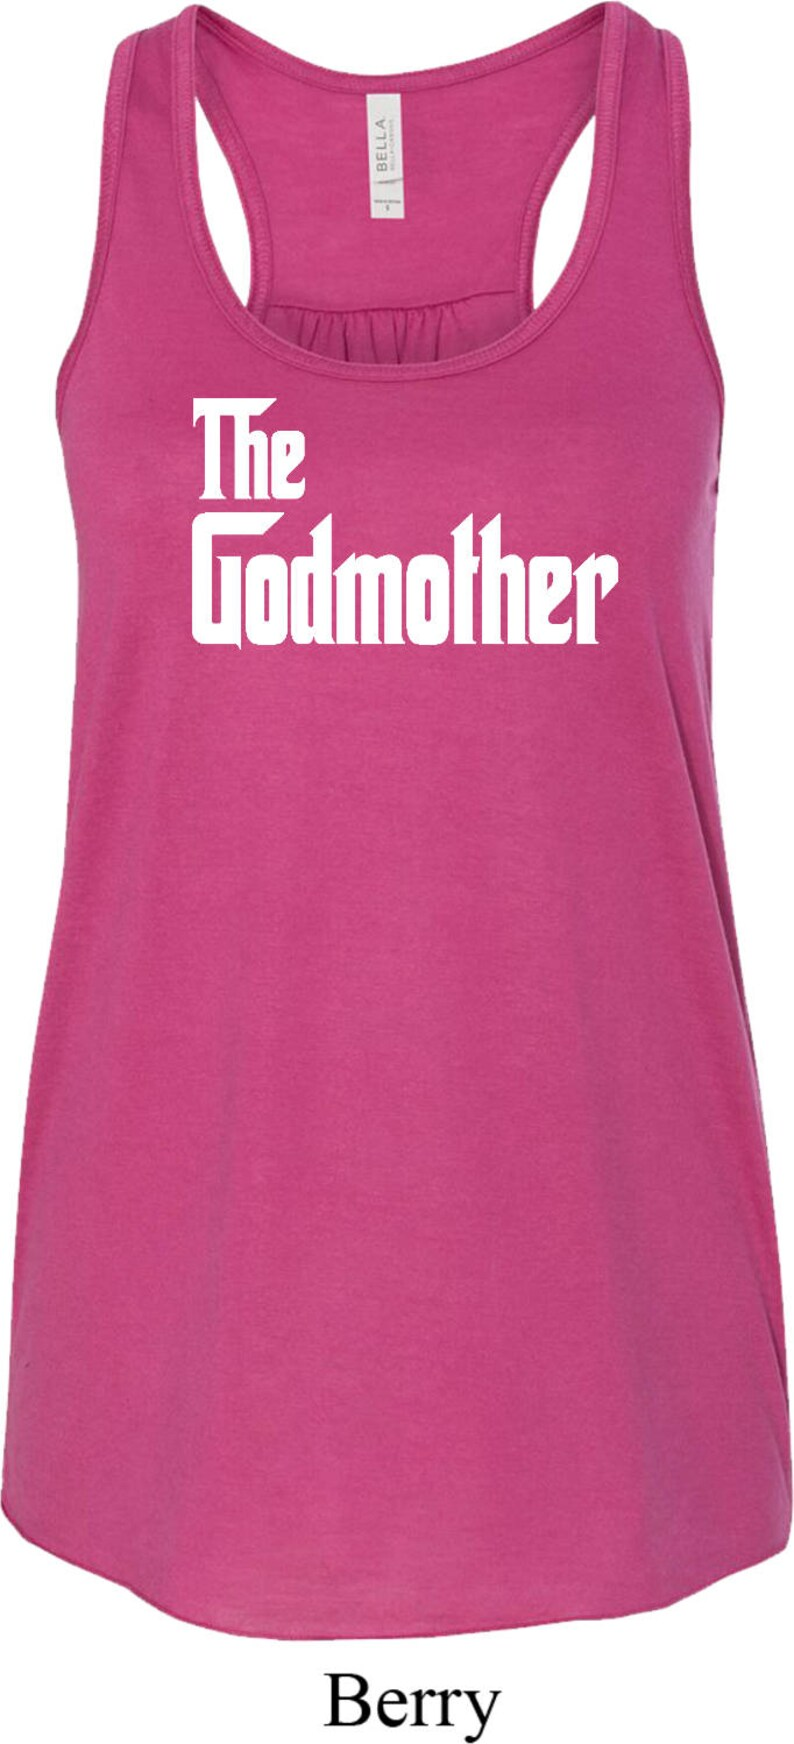 The Godmother White Print Ladies Flowy Racerback Tank Top WGODMOTHER-8800